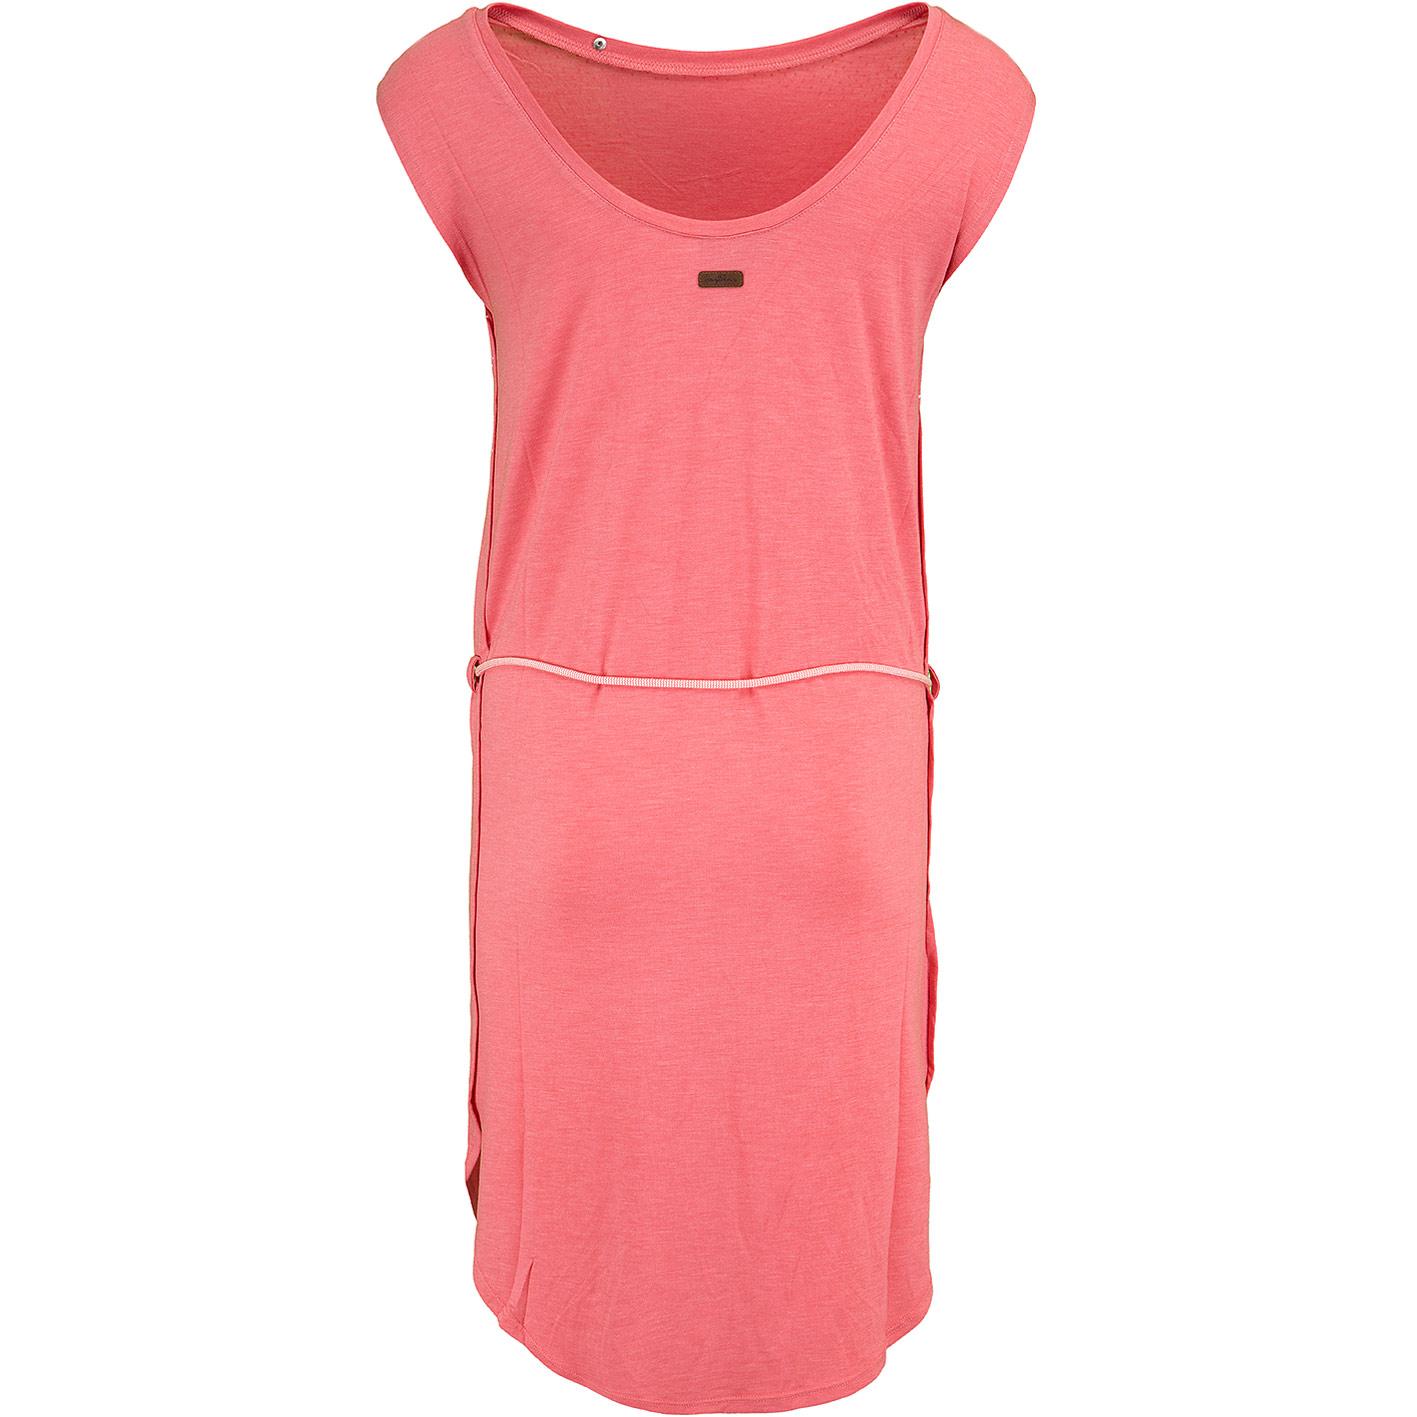 Ragwear Kleid Valencia orange - hier bestellen!